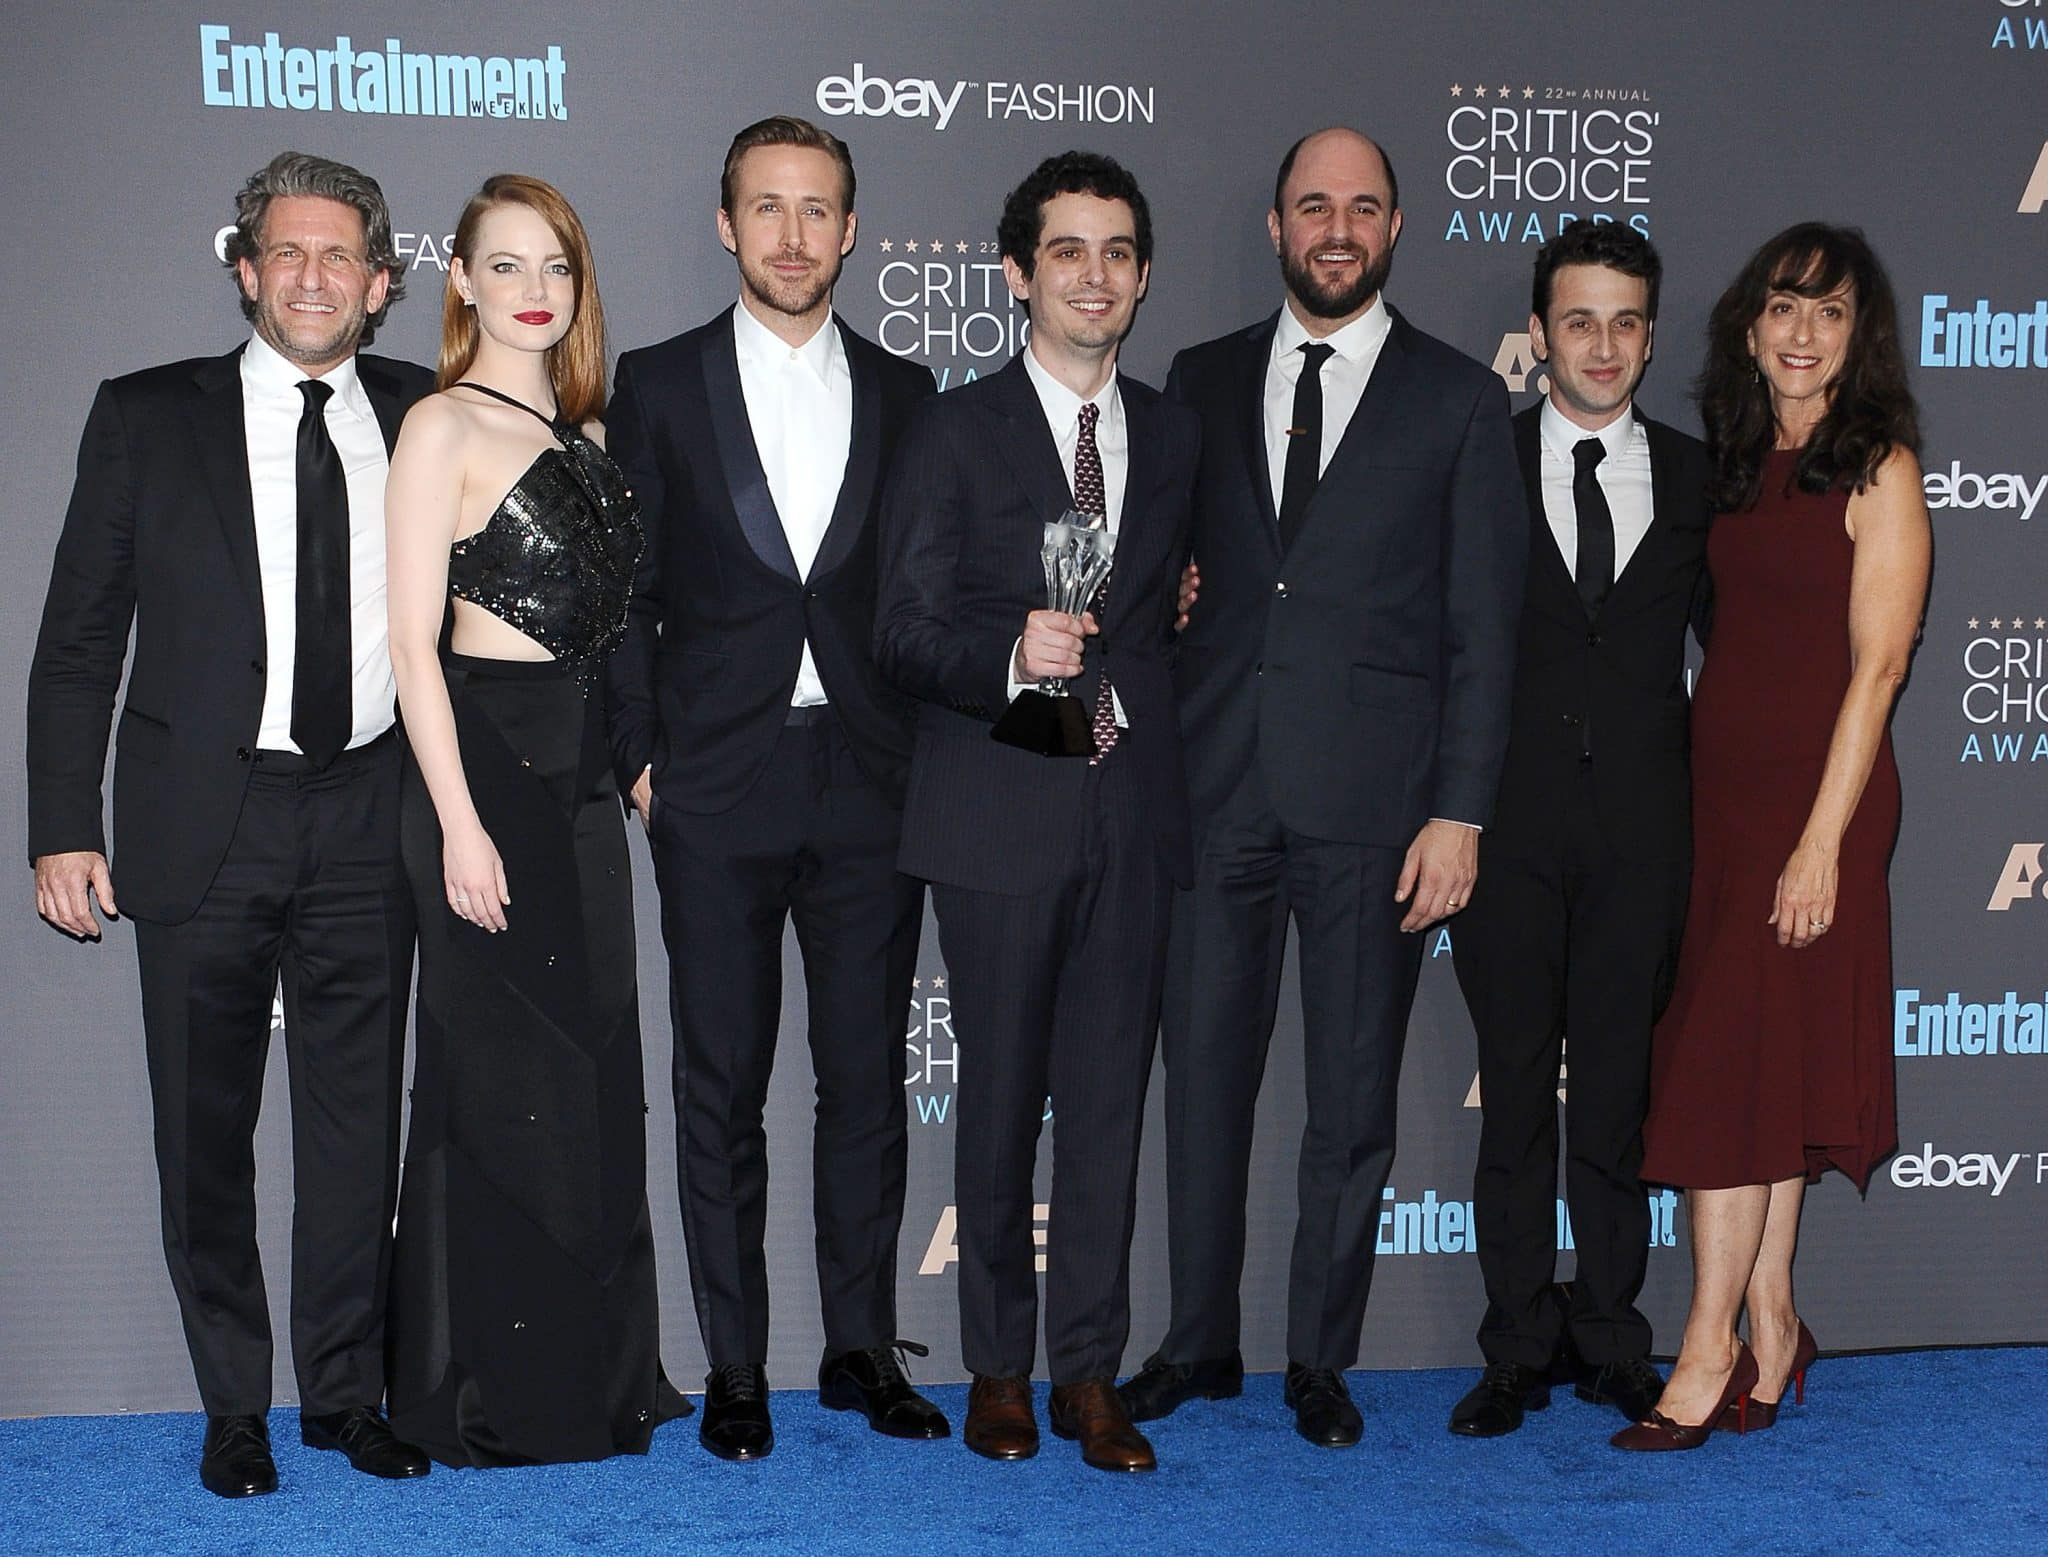 Vlaňajším víťazom sa stal film La La Land